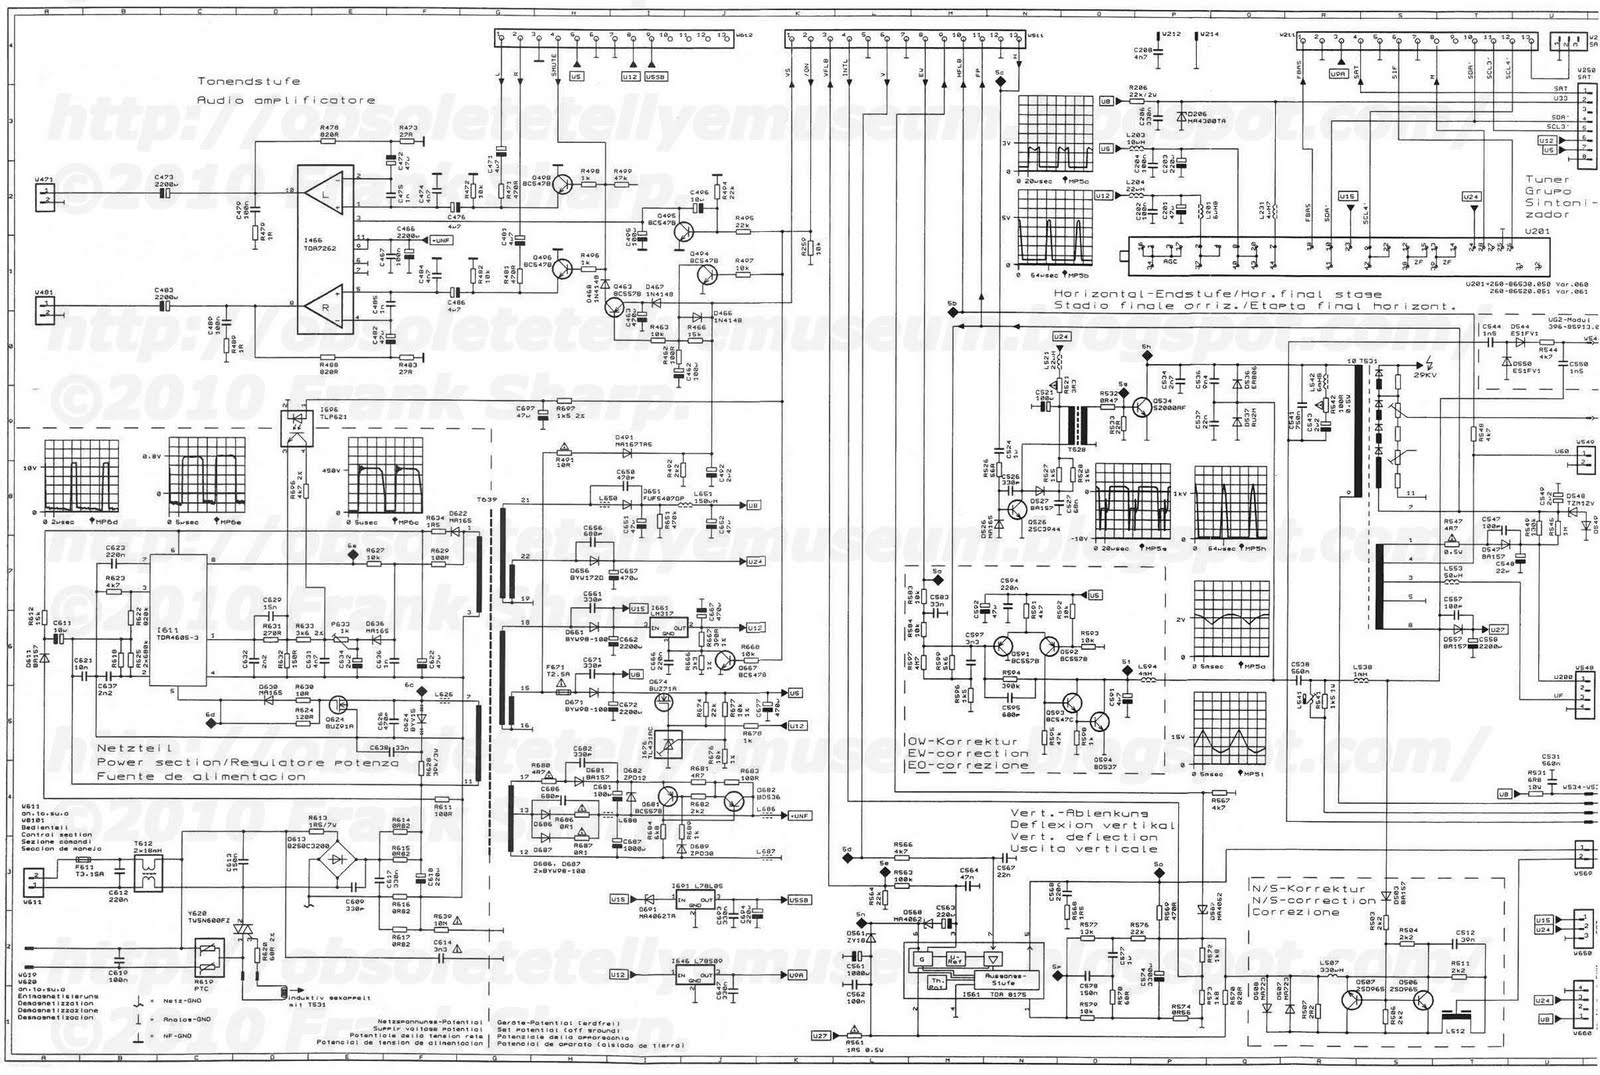 obsolete technology tellye    loewe planus 4272 e3001